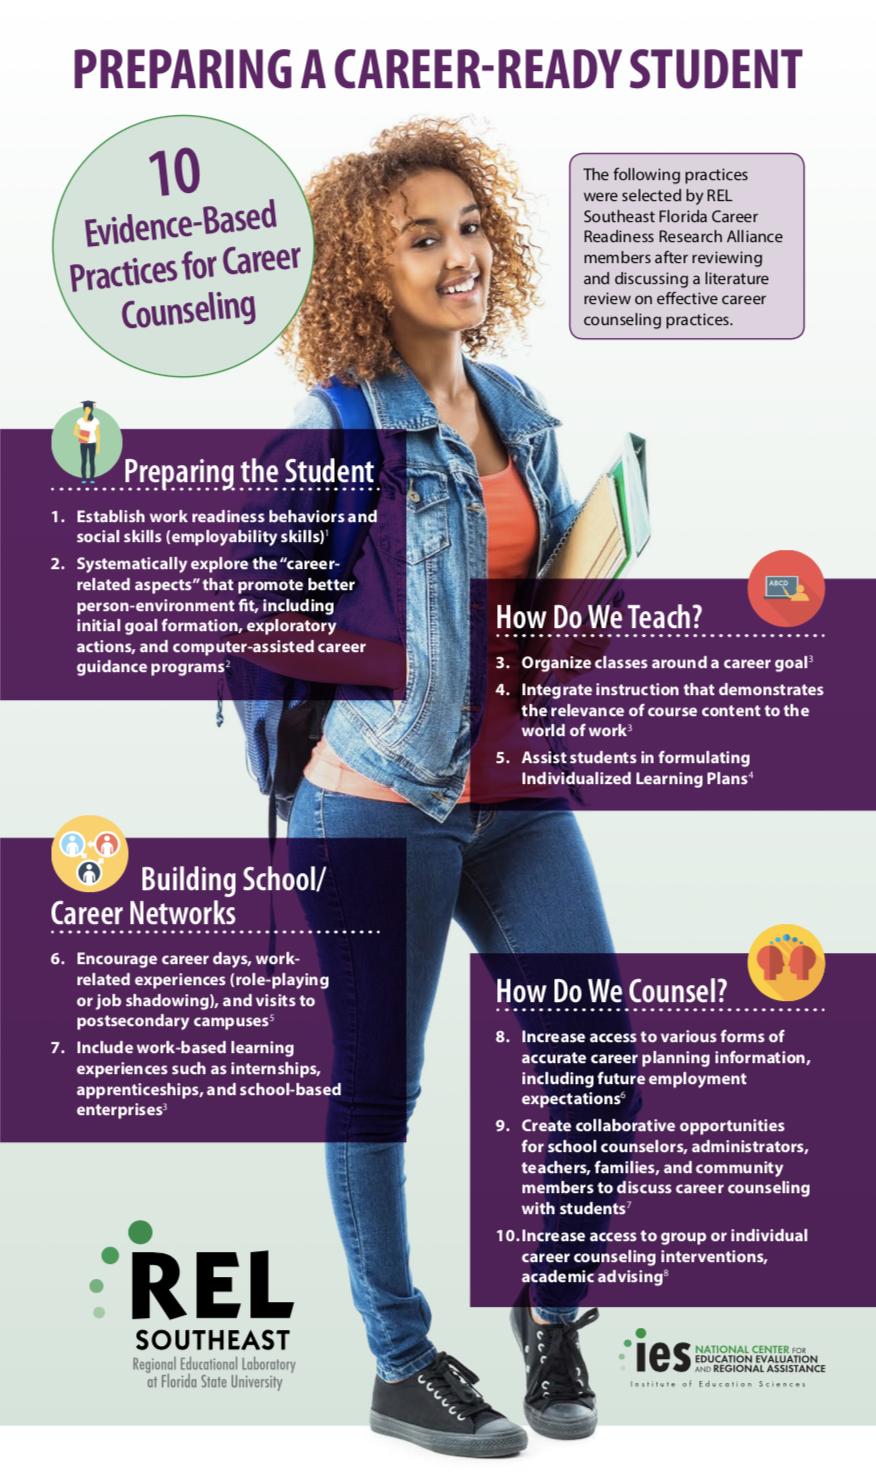 pdf focusing on preparing a career-ready student